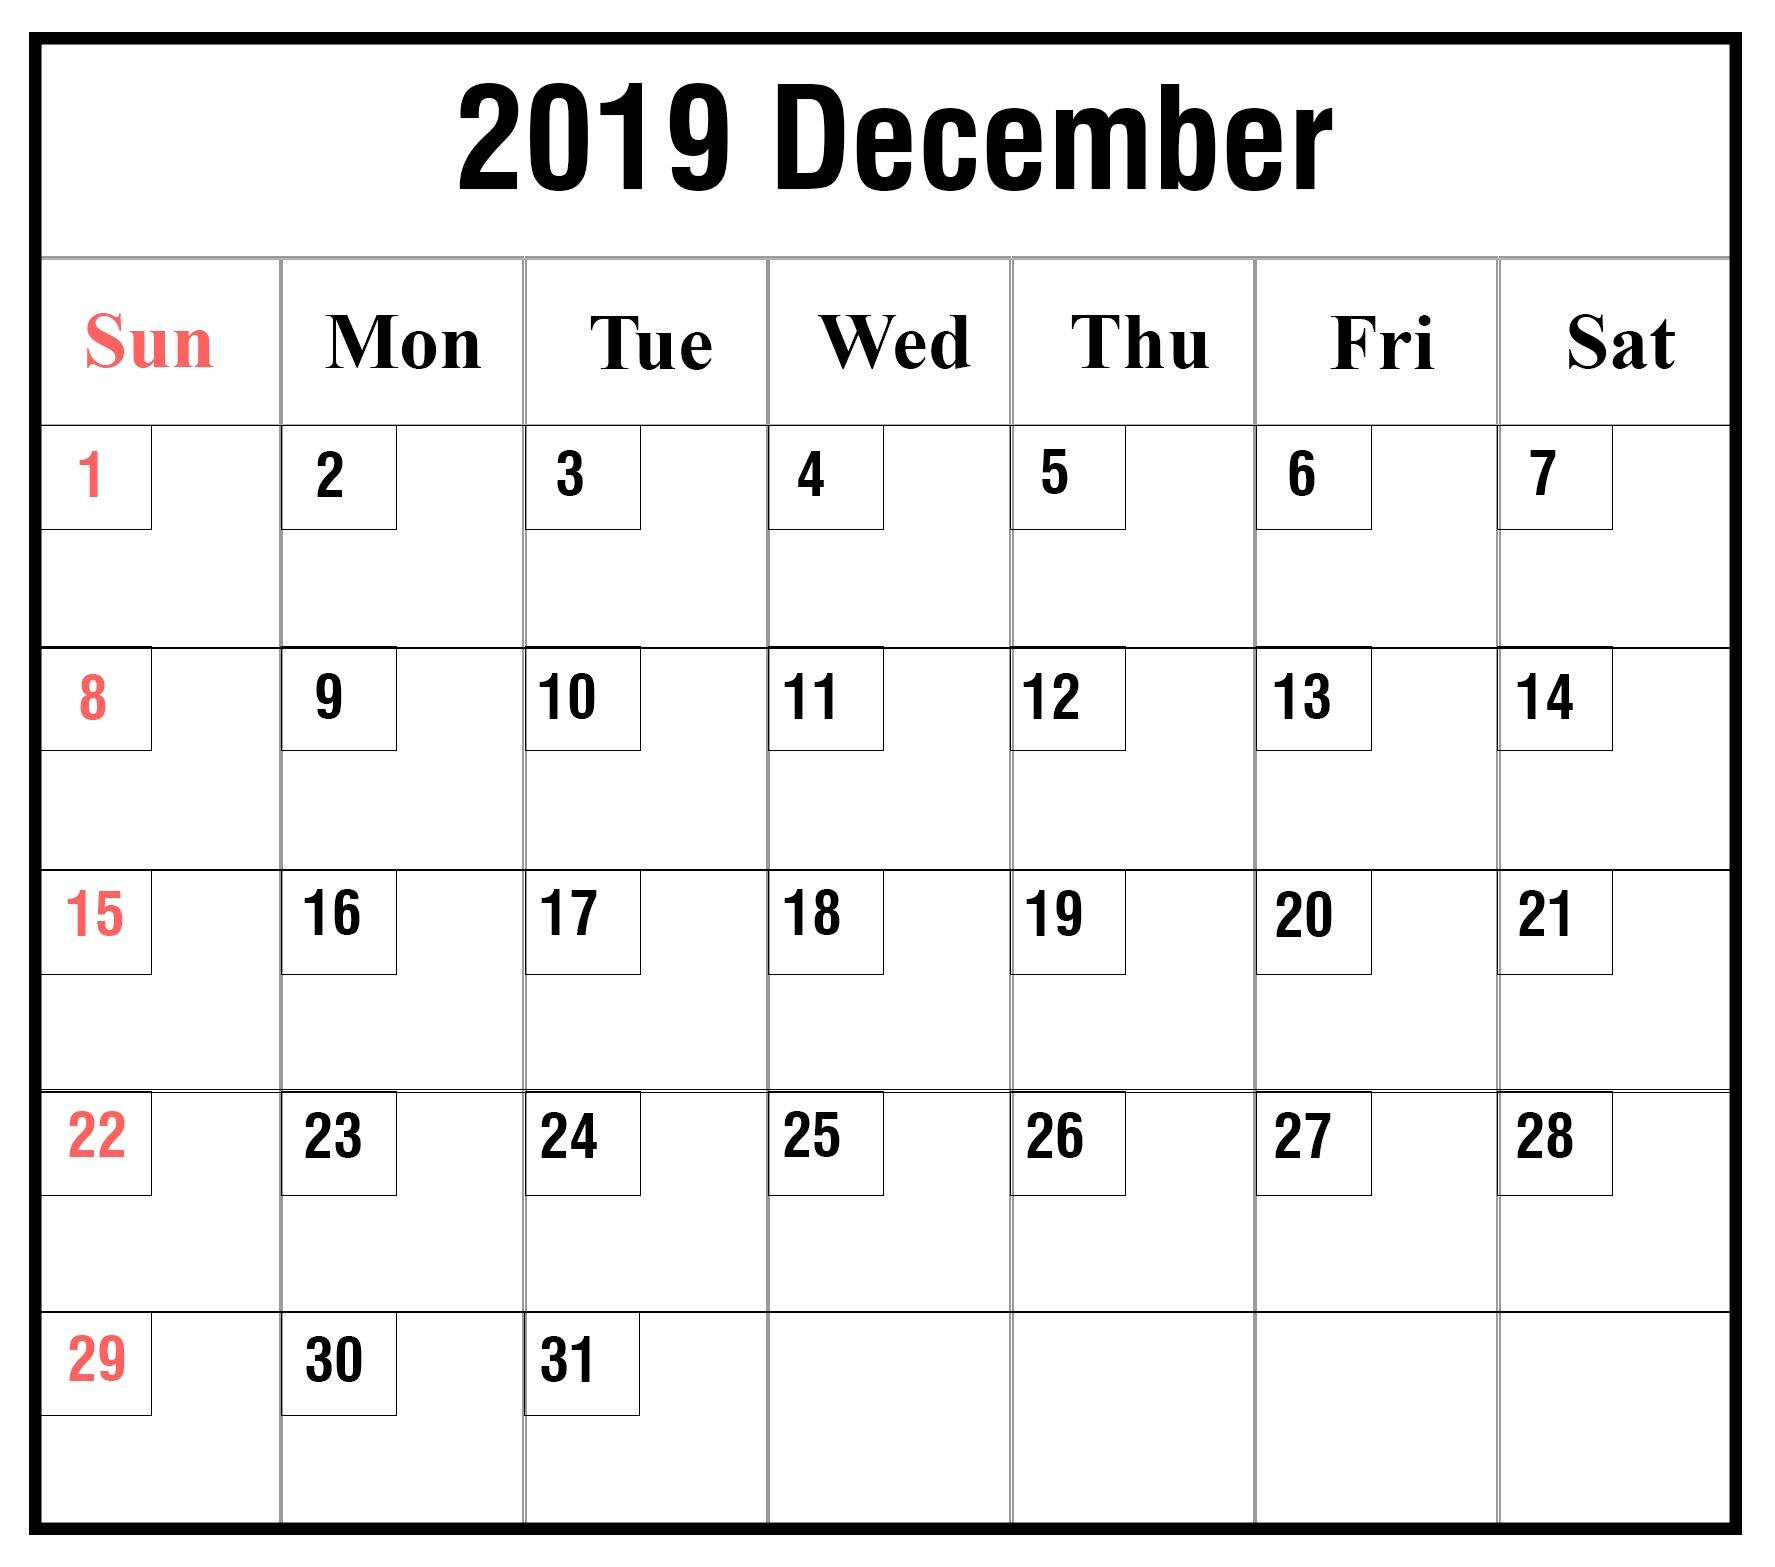 December-2019-9